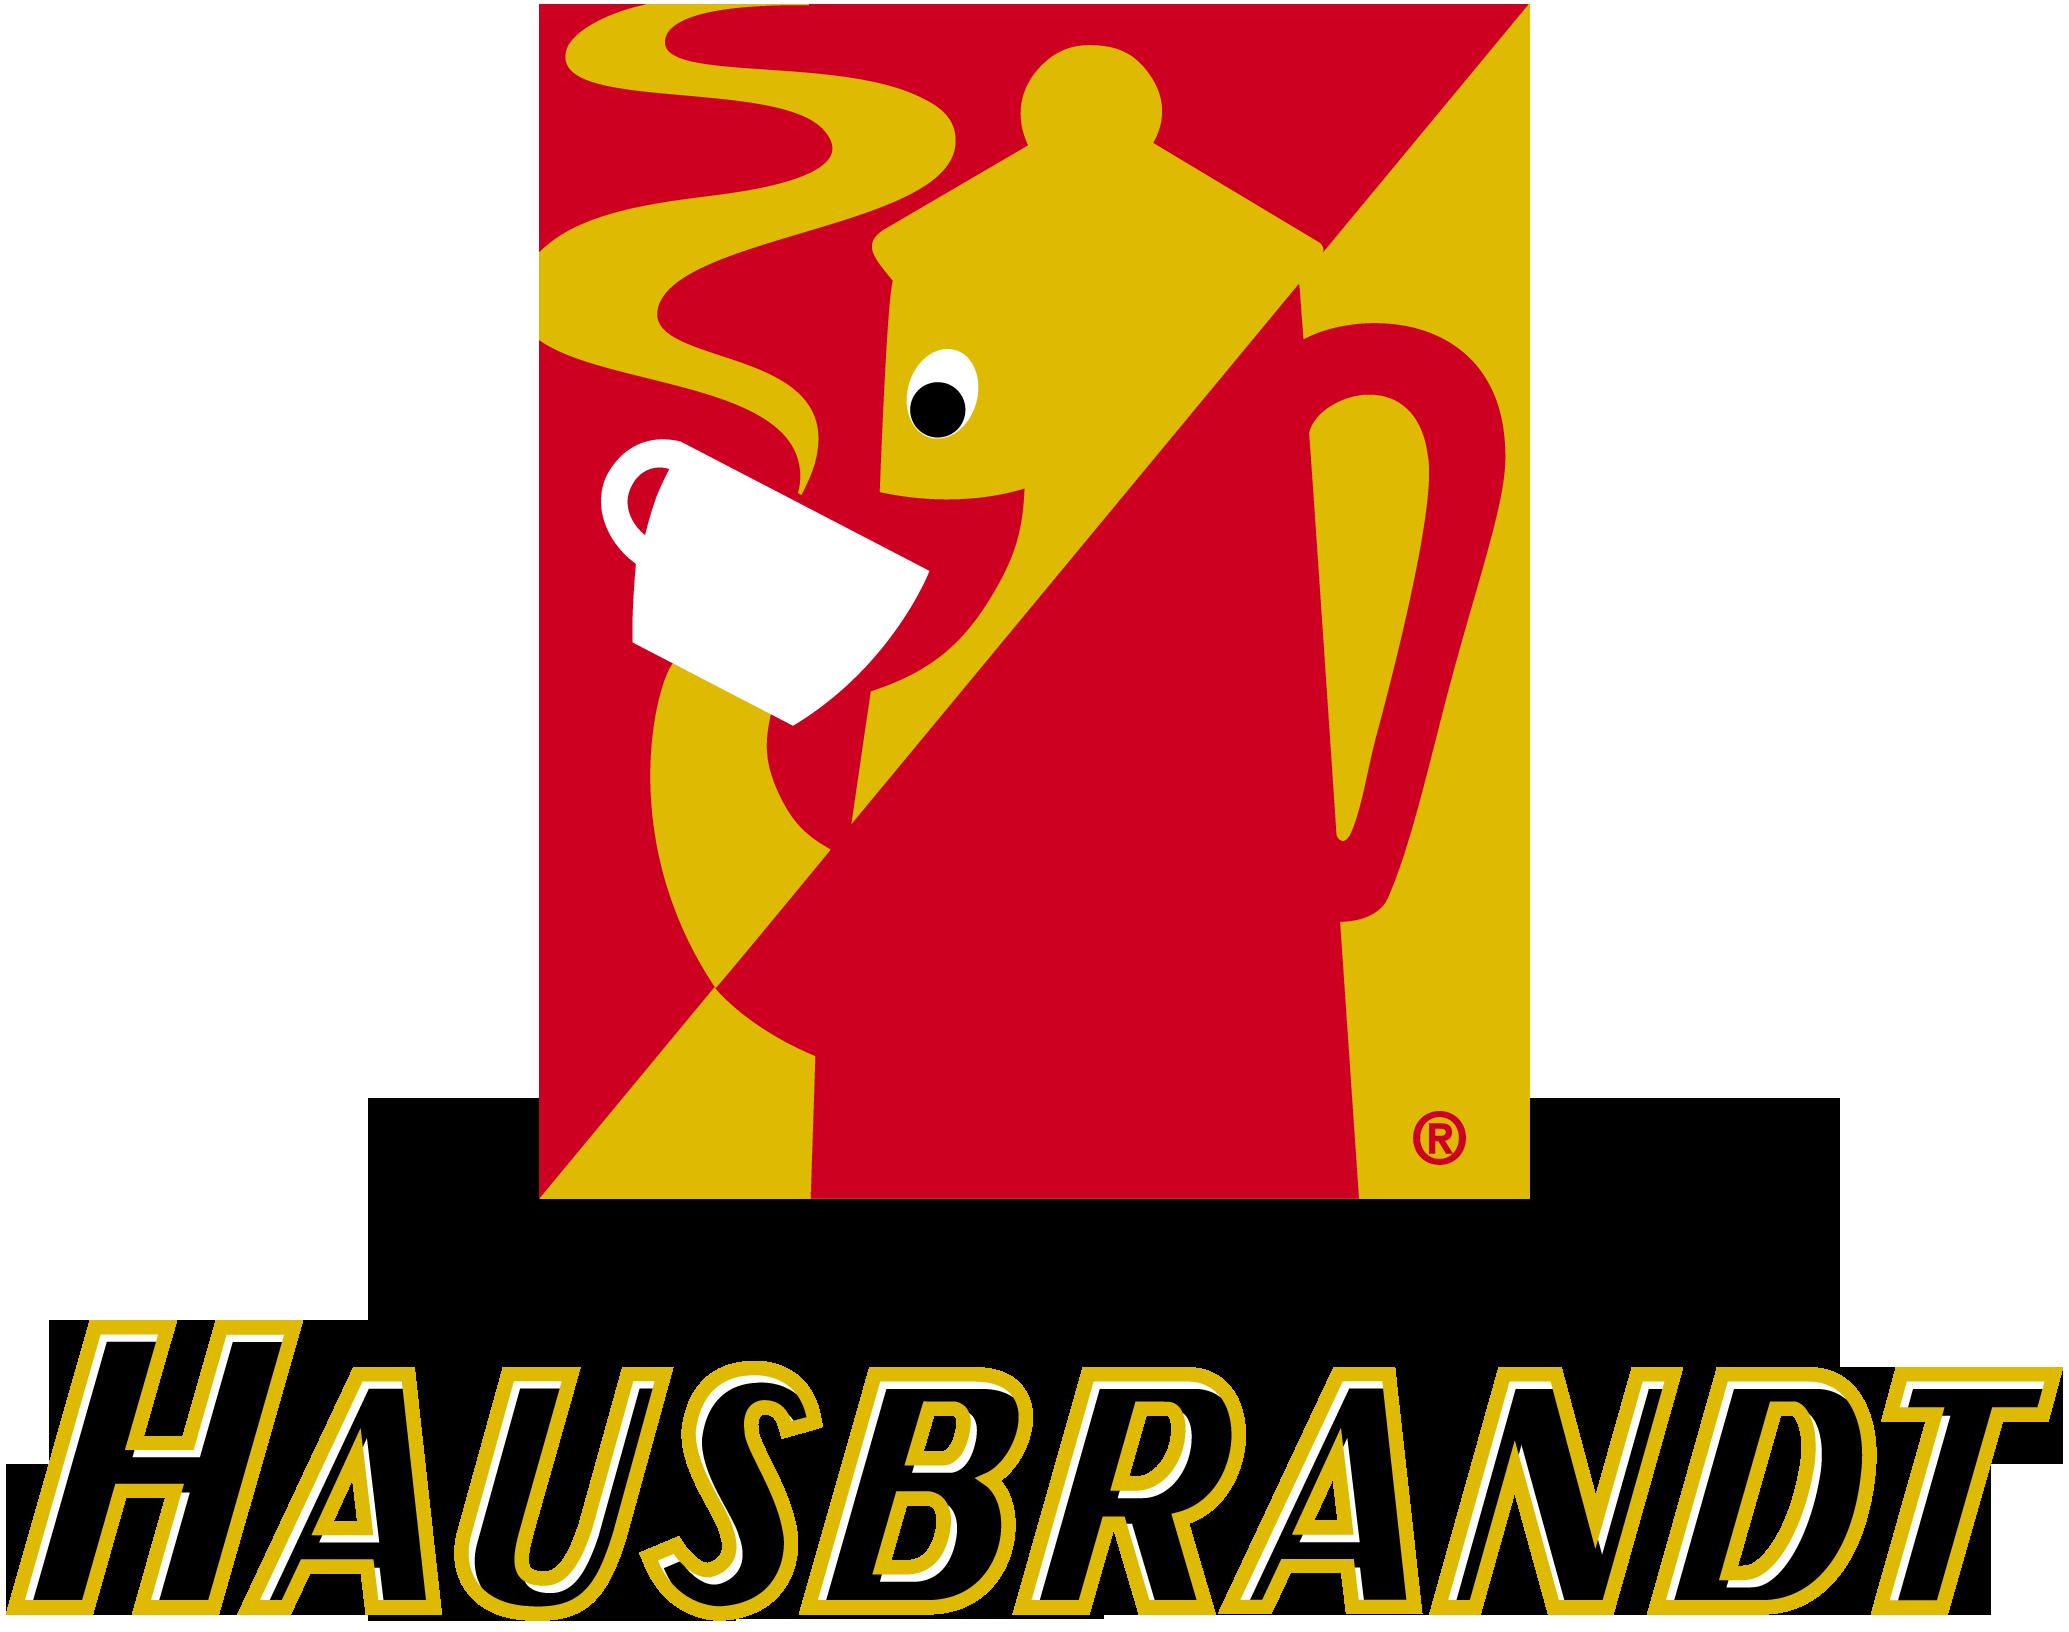 Hausbrandt - רק קפה